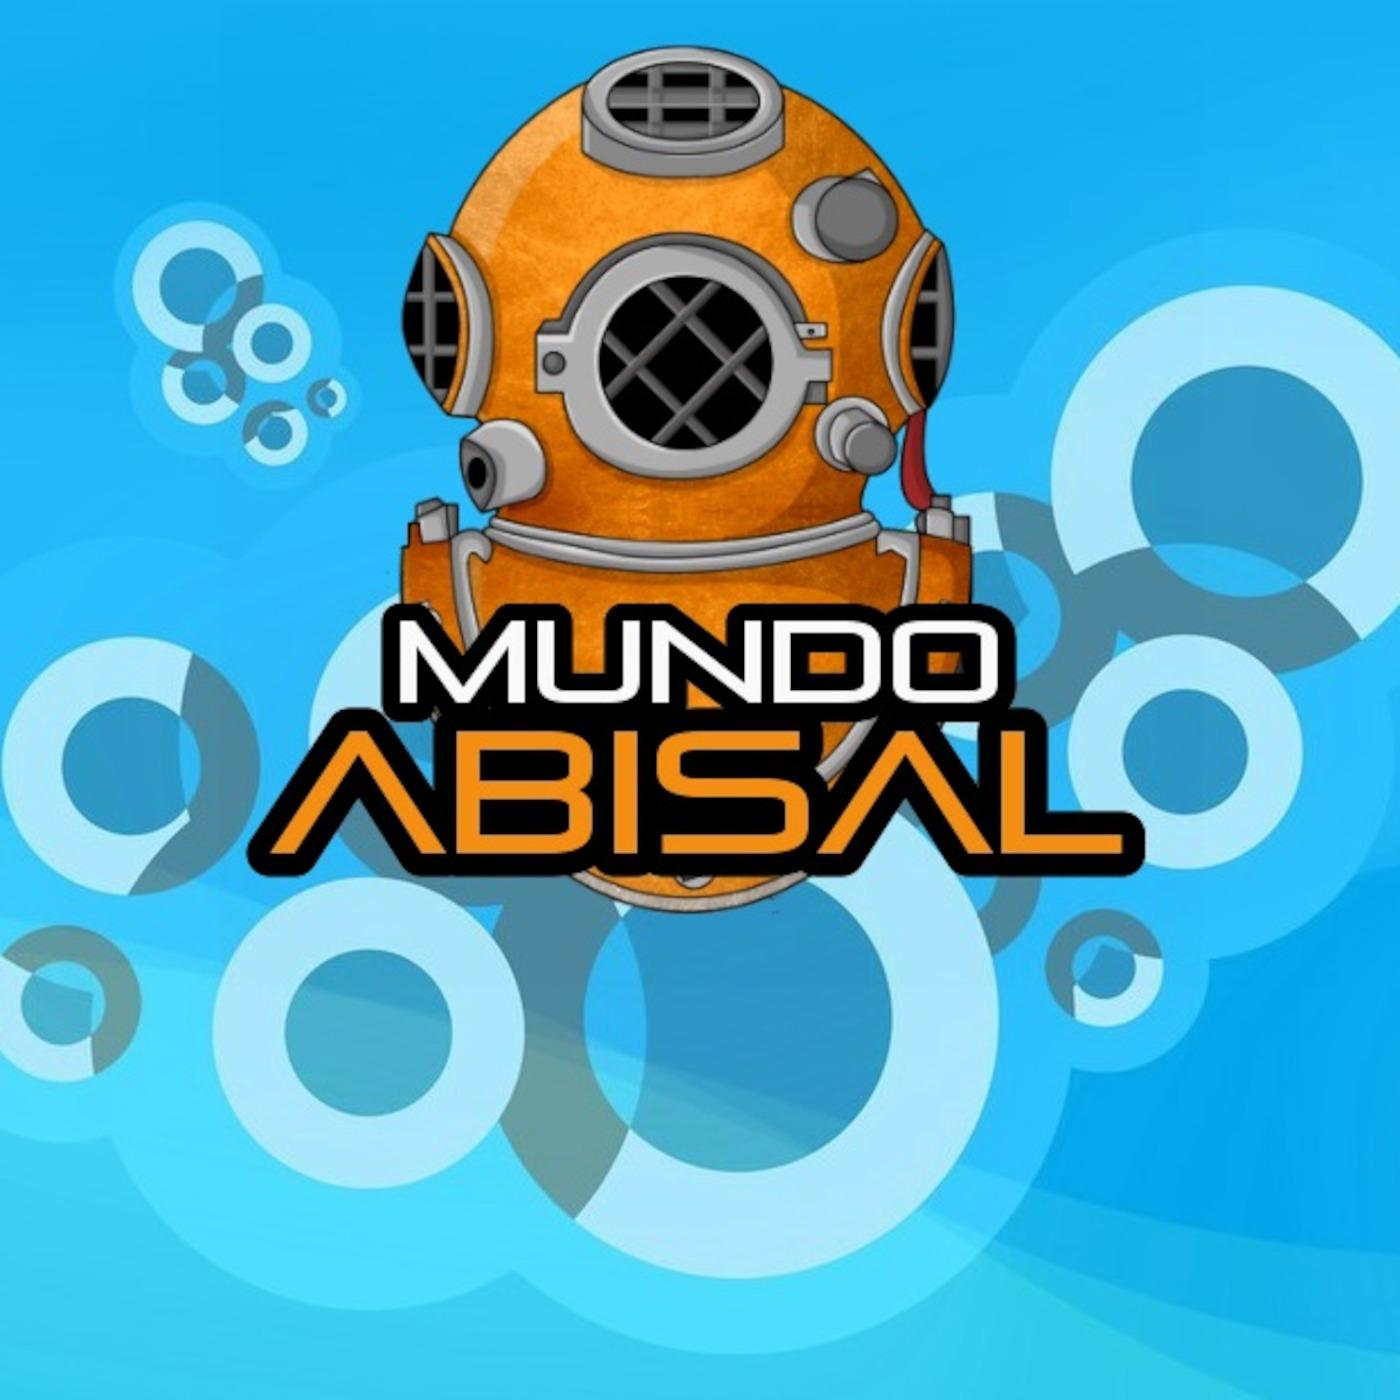 MundoAbisal